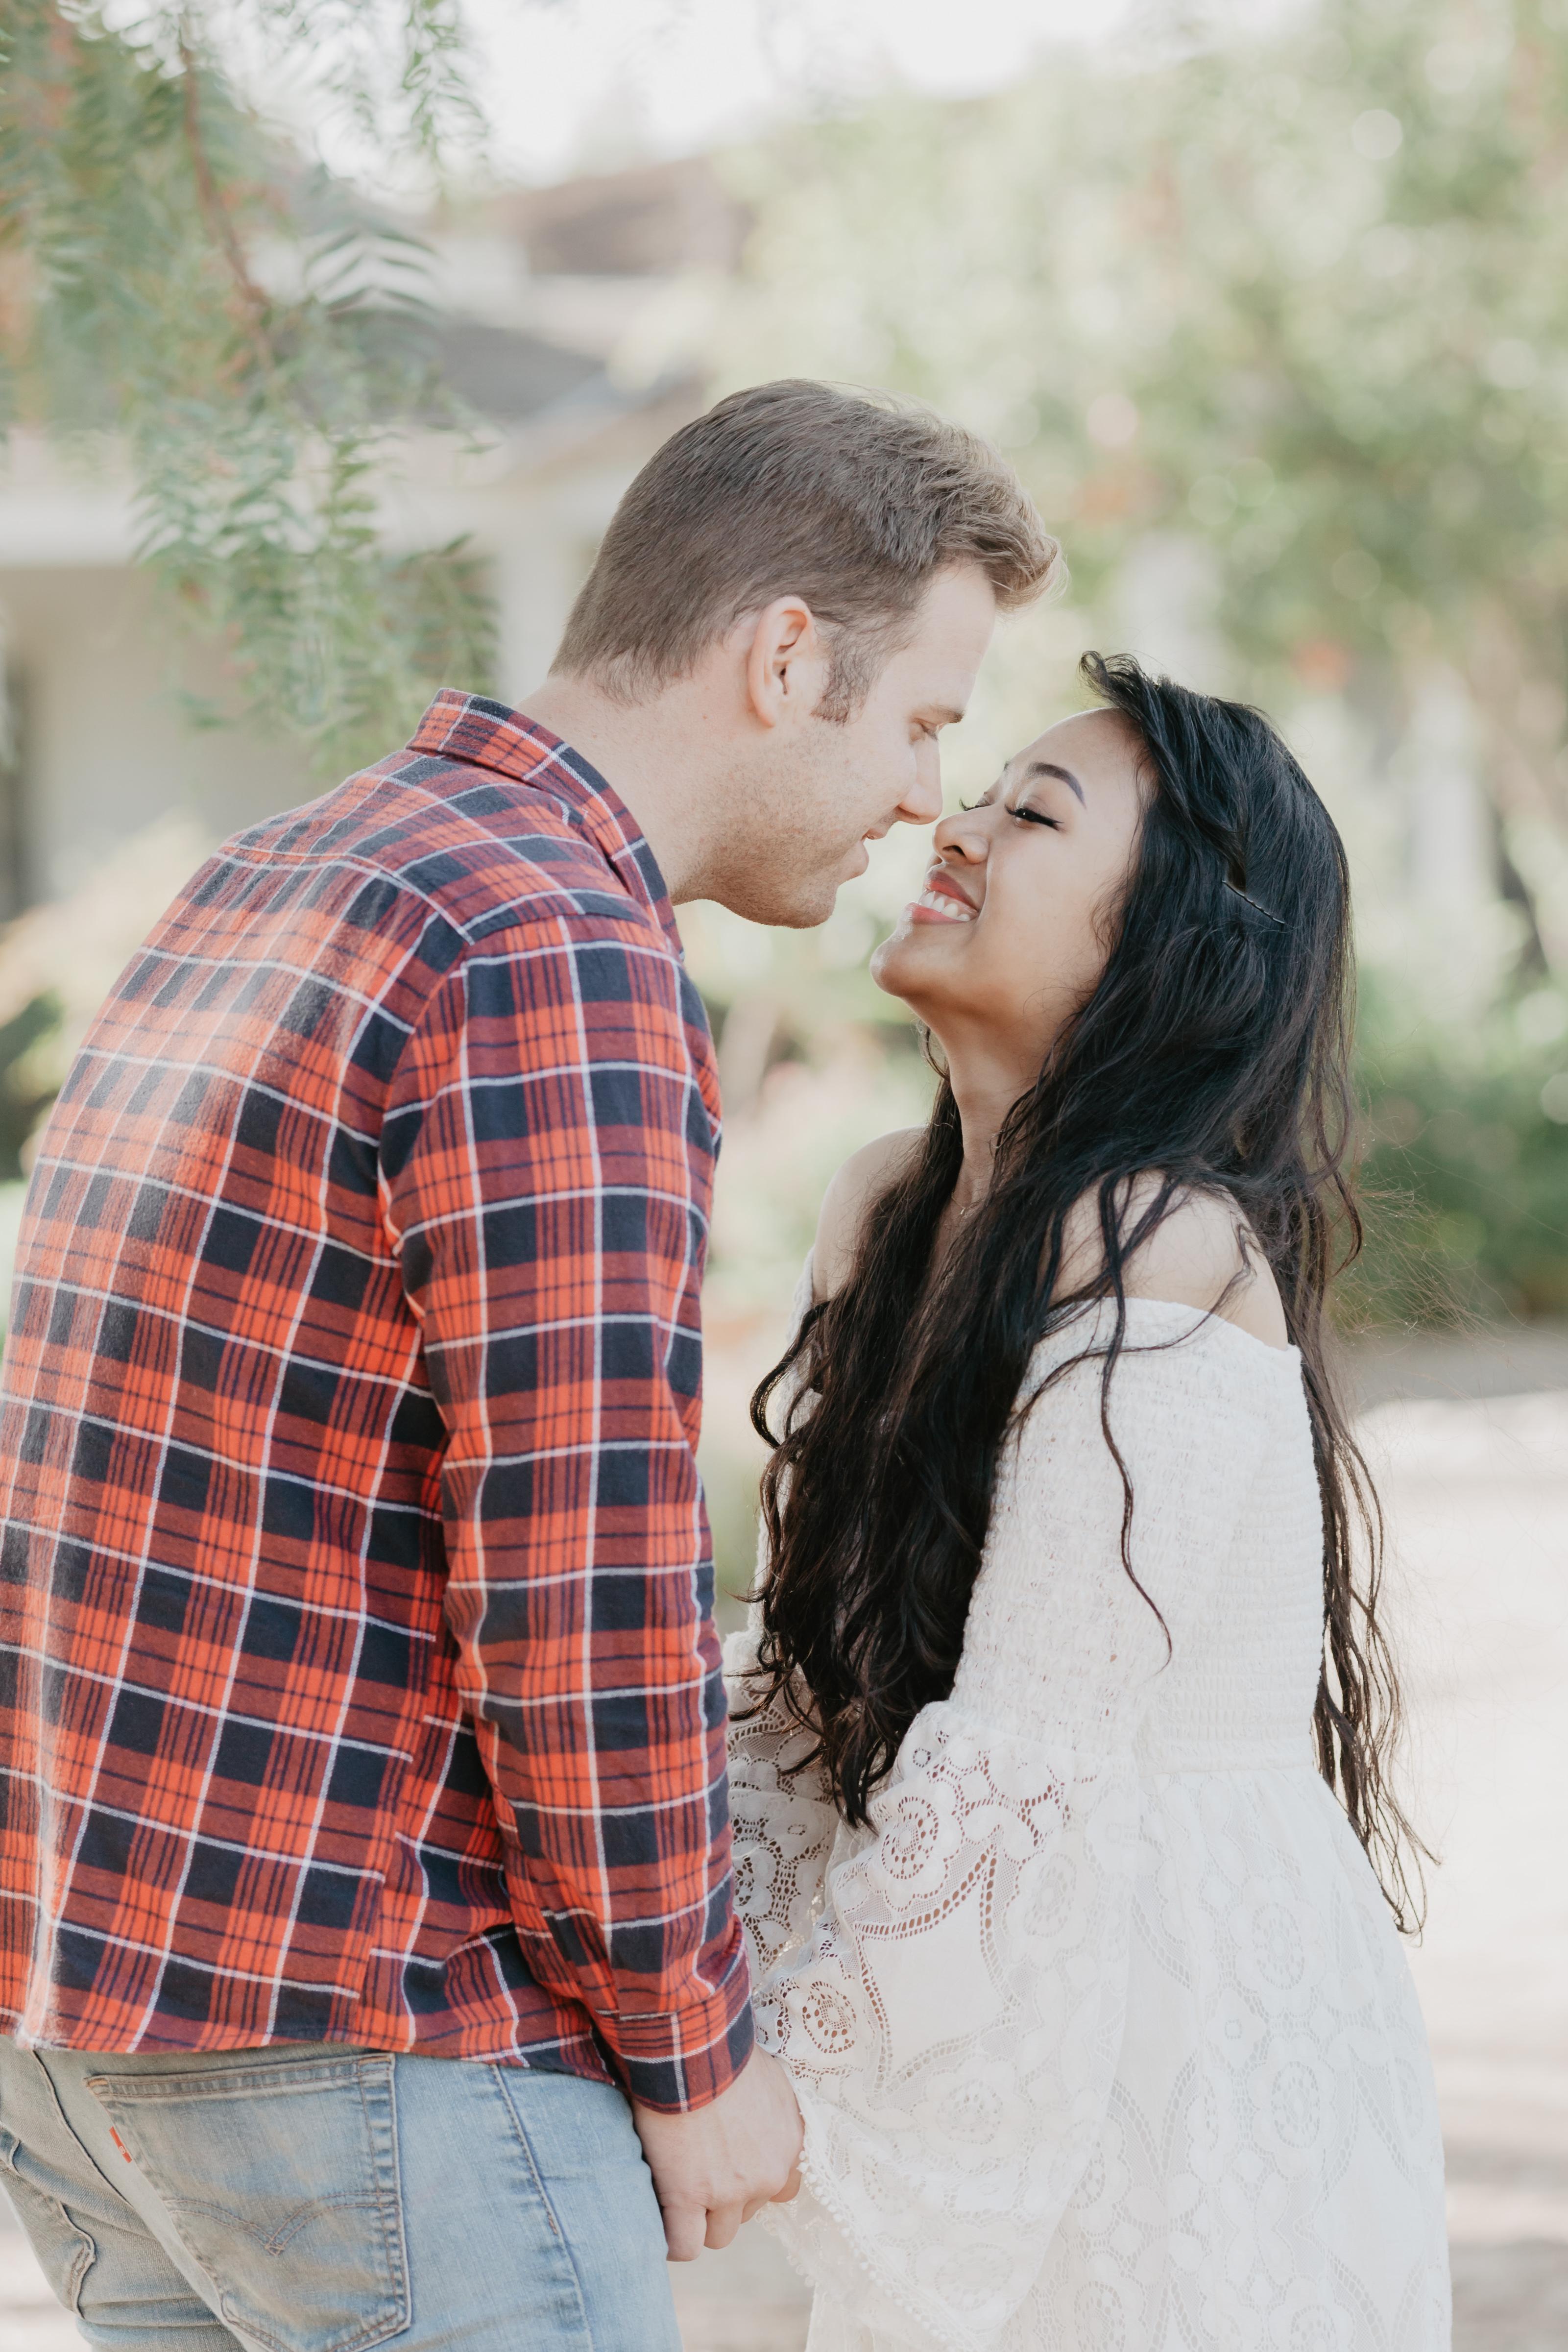 IMG 3966 2 - Lei and Matthew | Engaged | San Diego wedding photographer